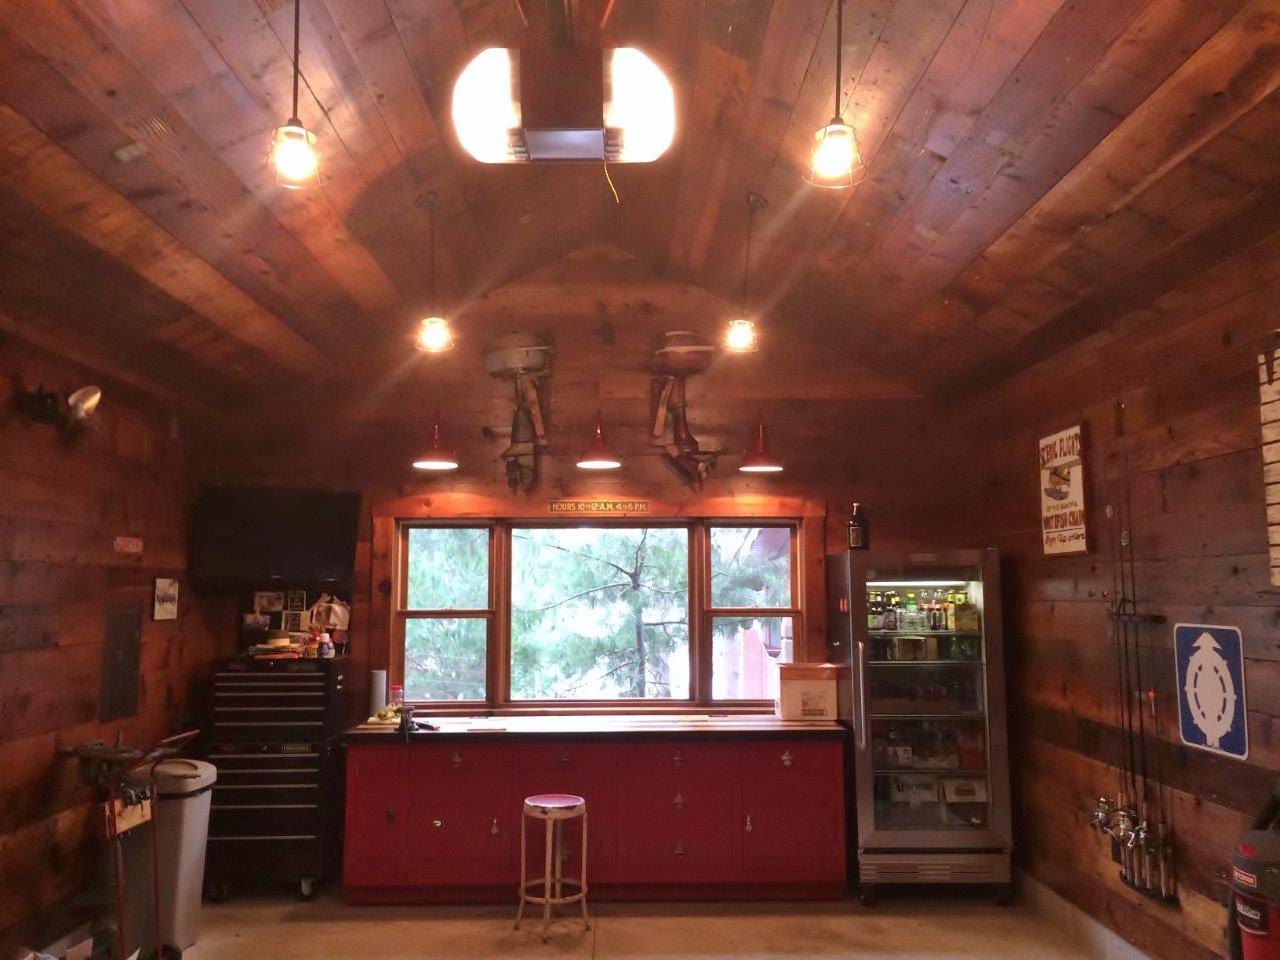 hight resolution of classic gooseneck barn lights give new space u0027old garage u0027 feelclassic gooseneck barn lights